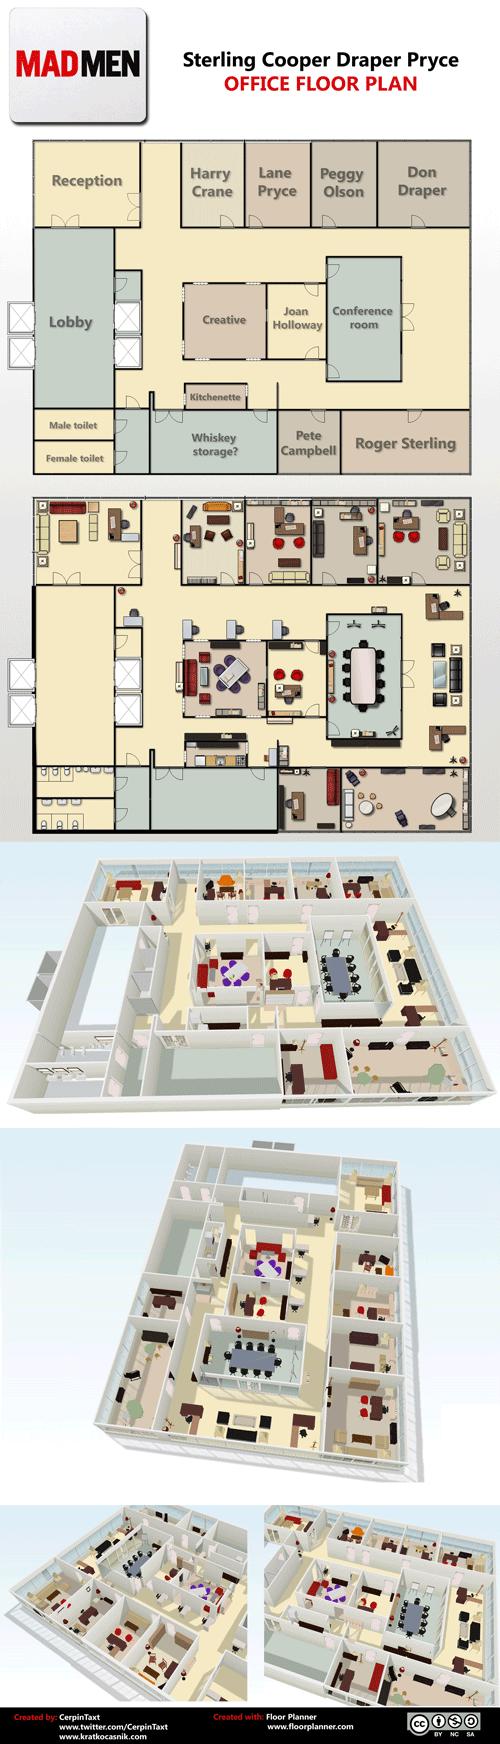 Sterling Cooper Draper Pryce Floorplan